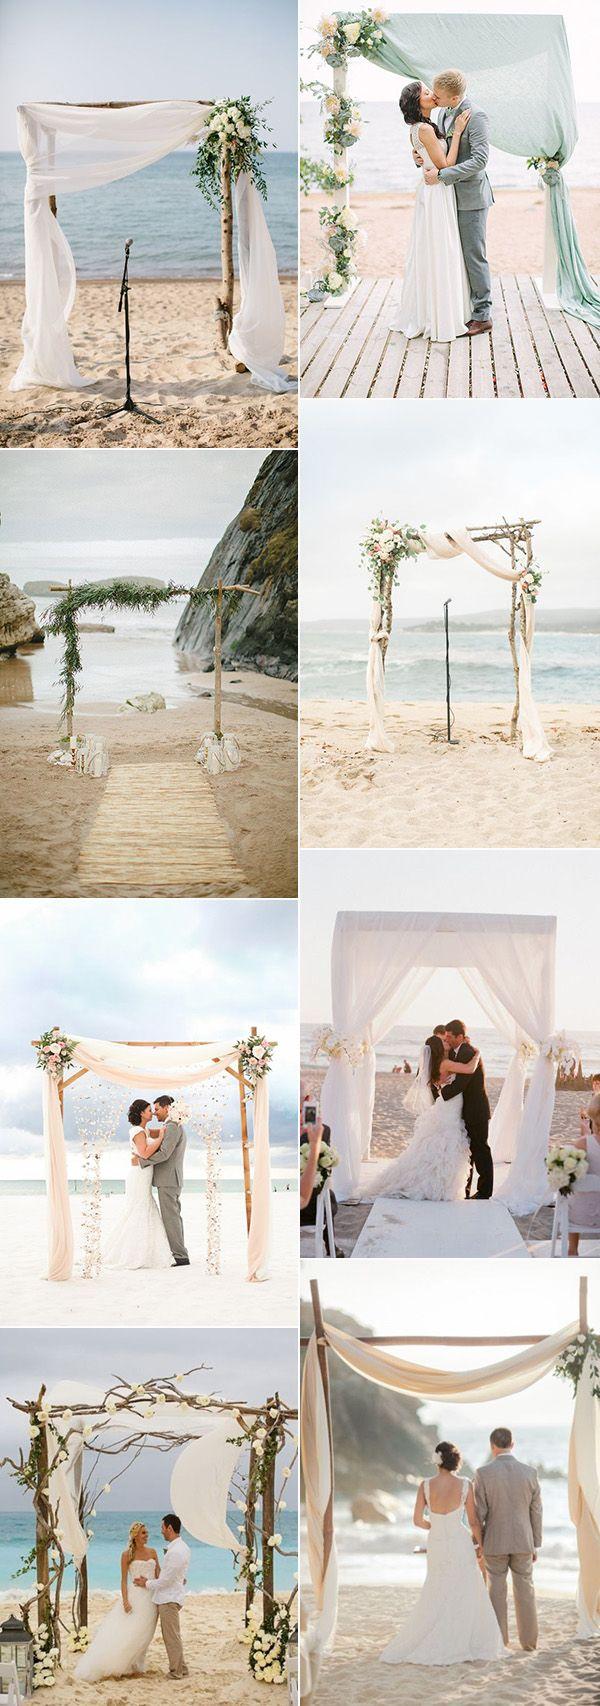 Wedding decorations reception october 2018  Brilliant Beach Wedding Ideas for  trends  October